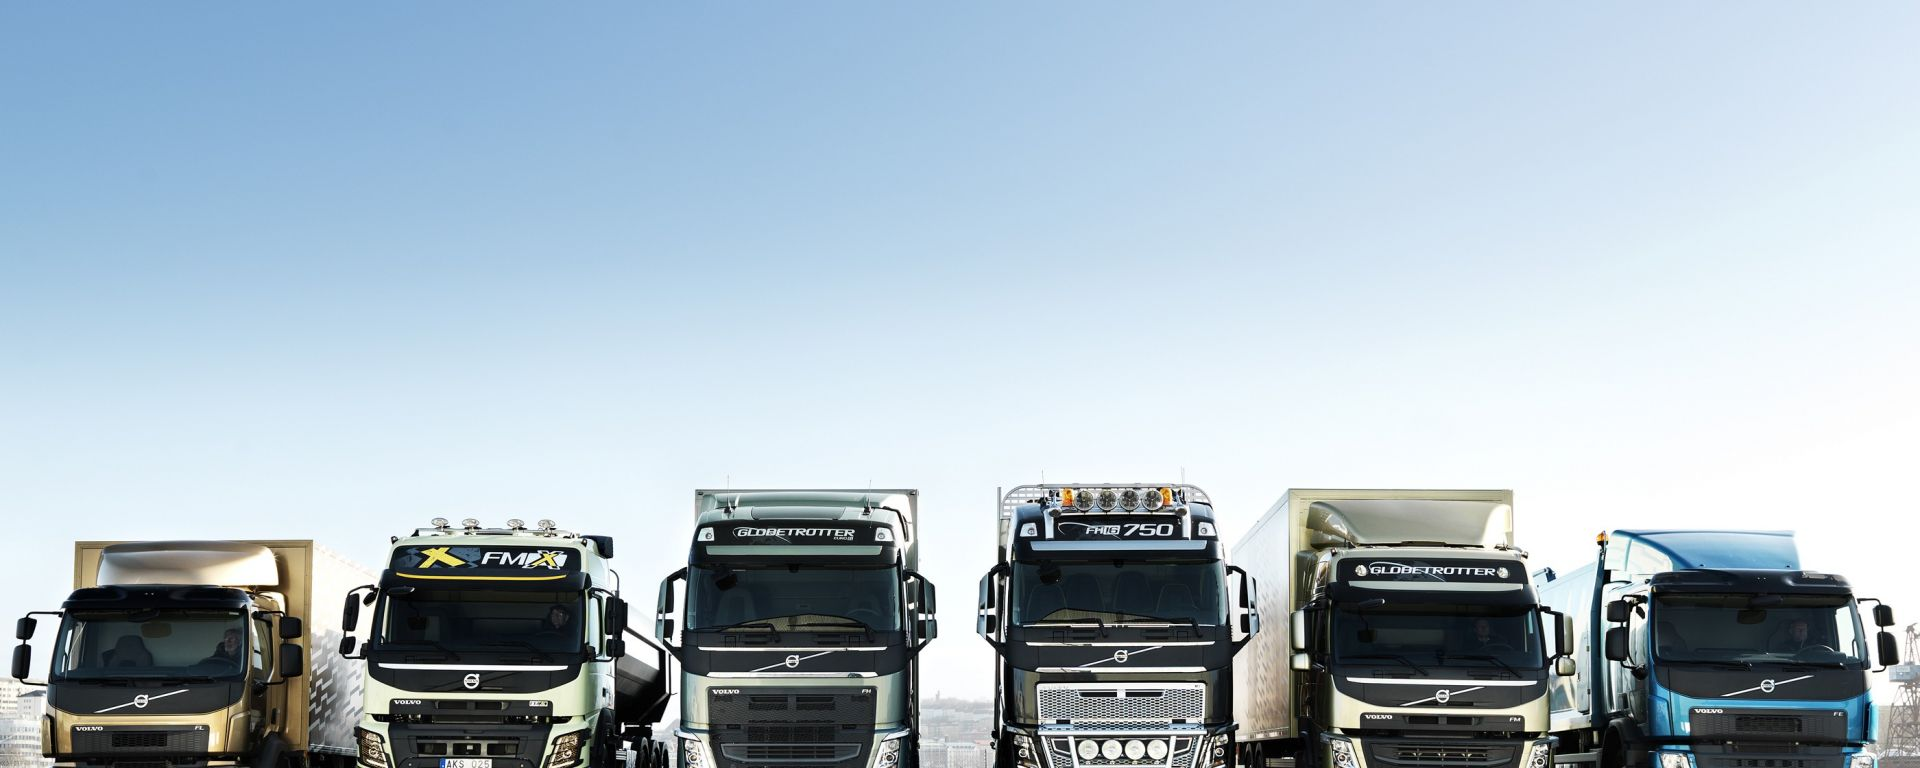 Volvo Trucks rinnova la gamma